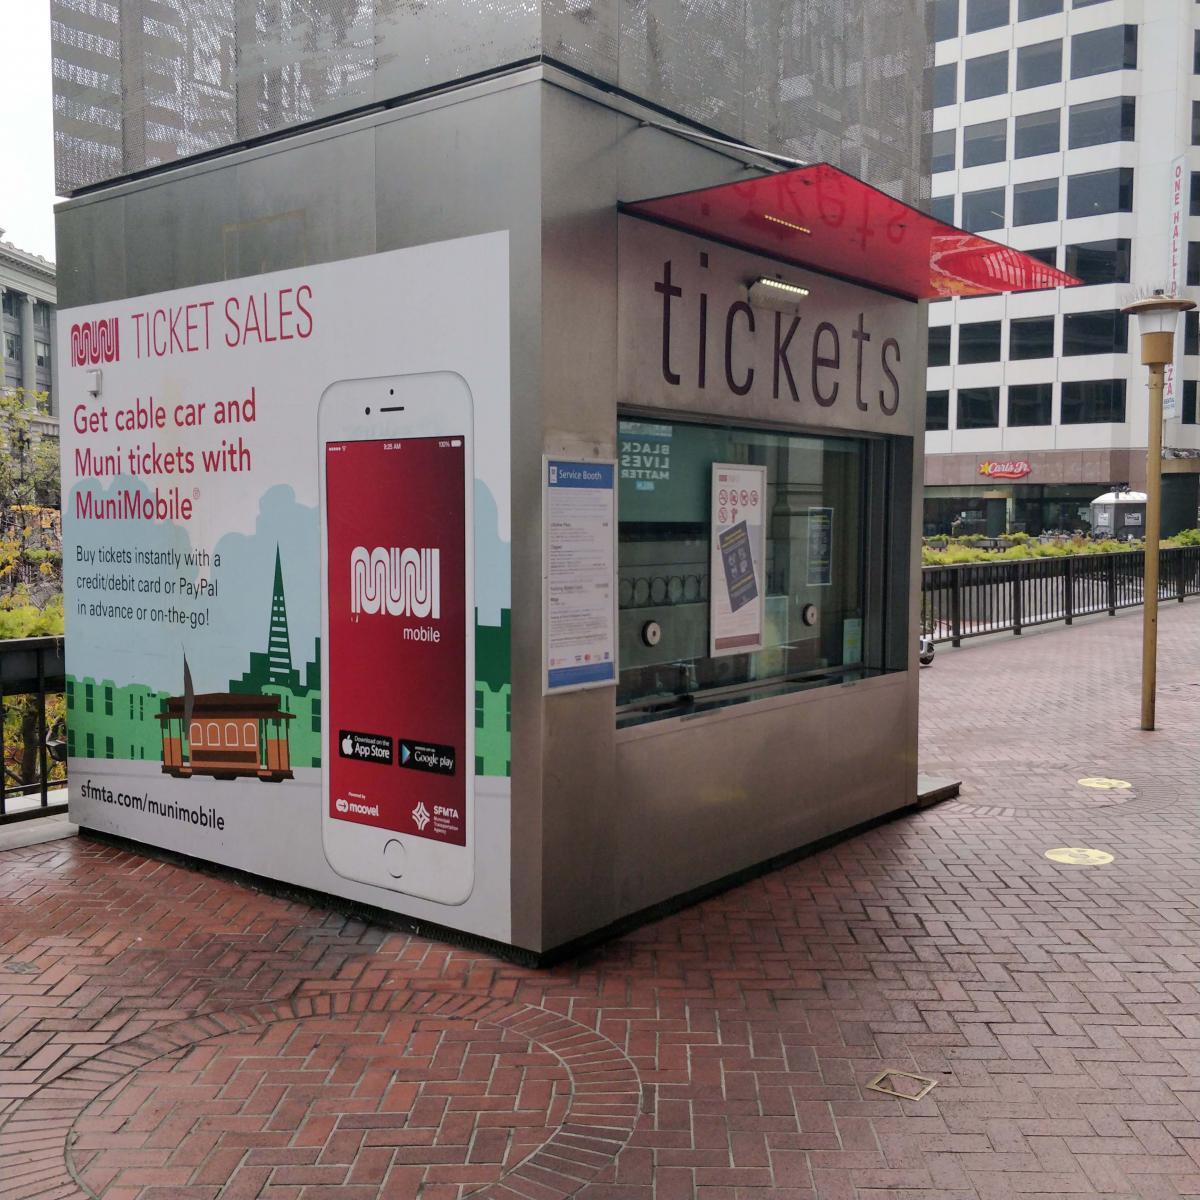 Customer Service Kiosks Provide New Services